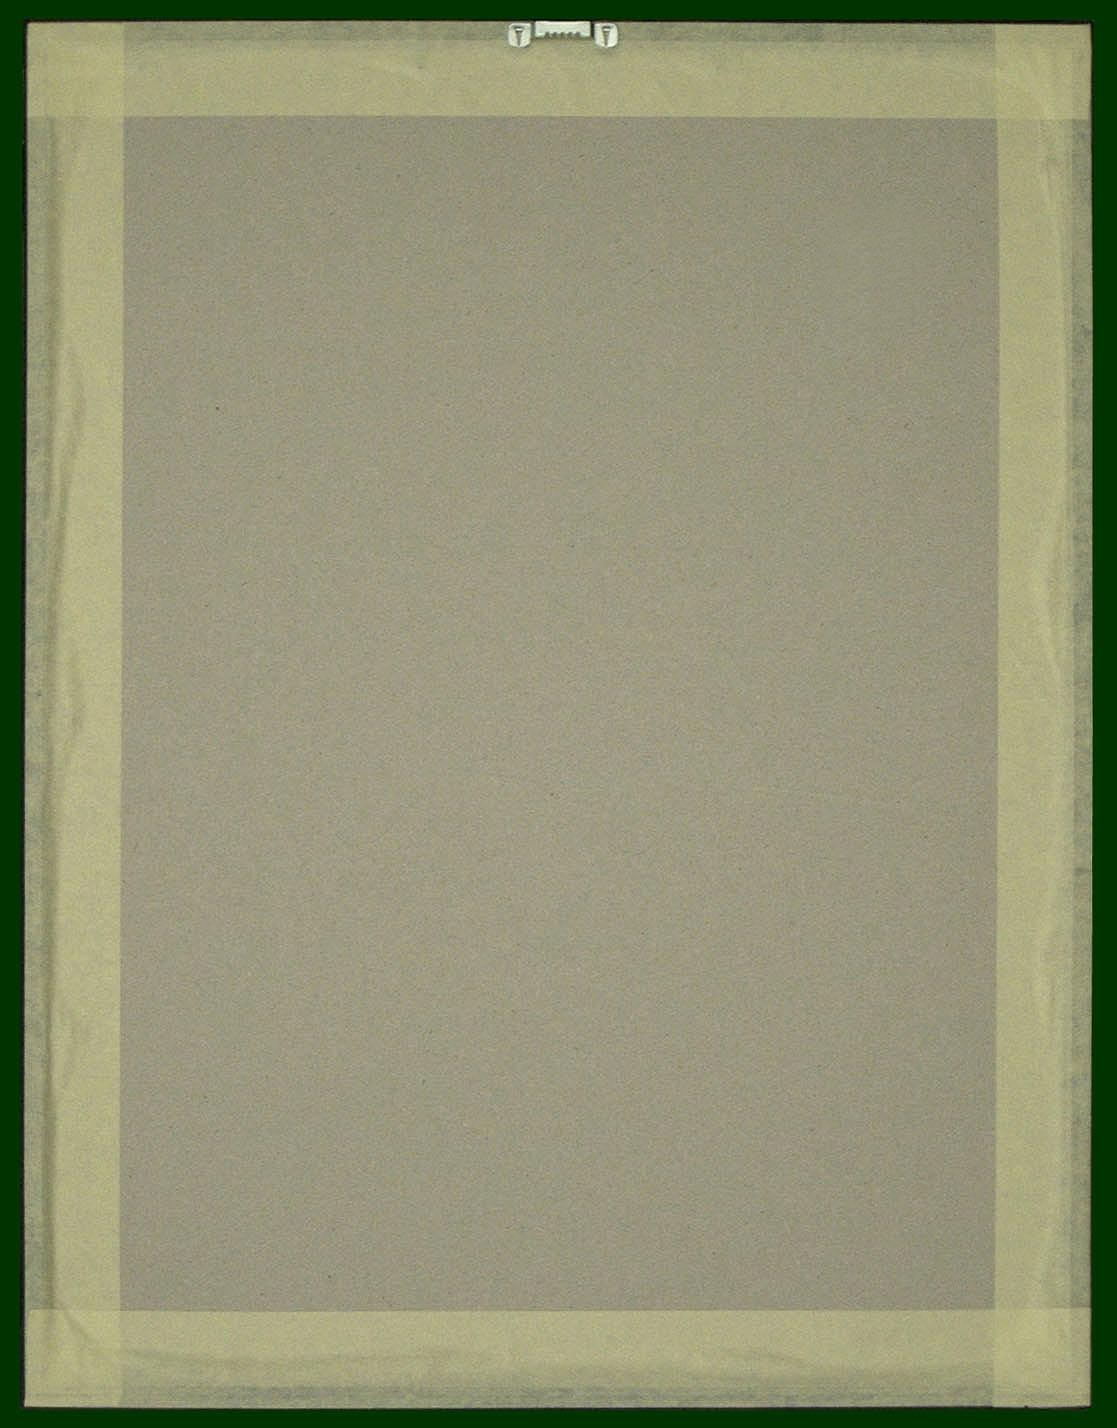 66-3hat.JPG (1117×1428)